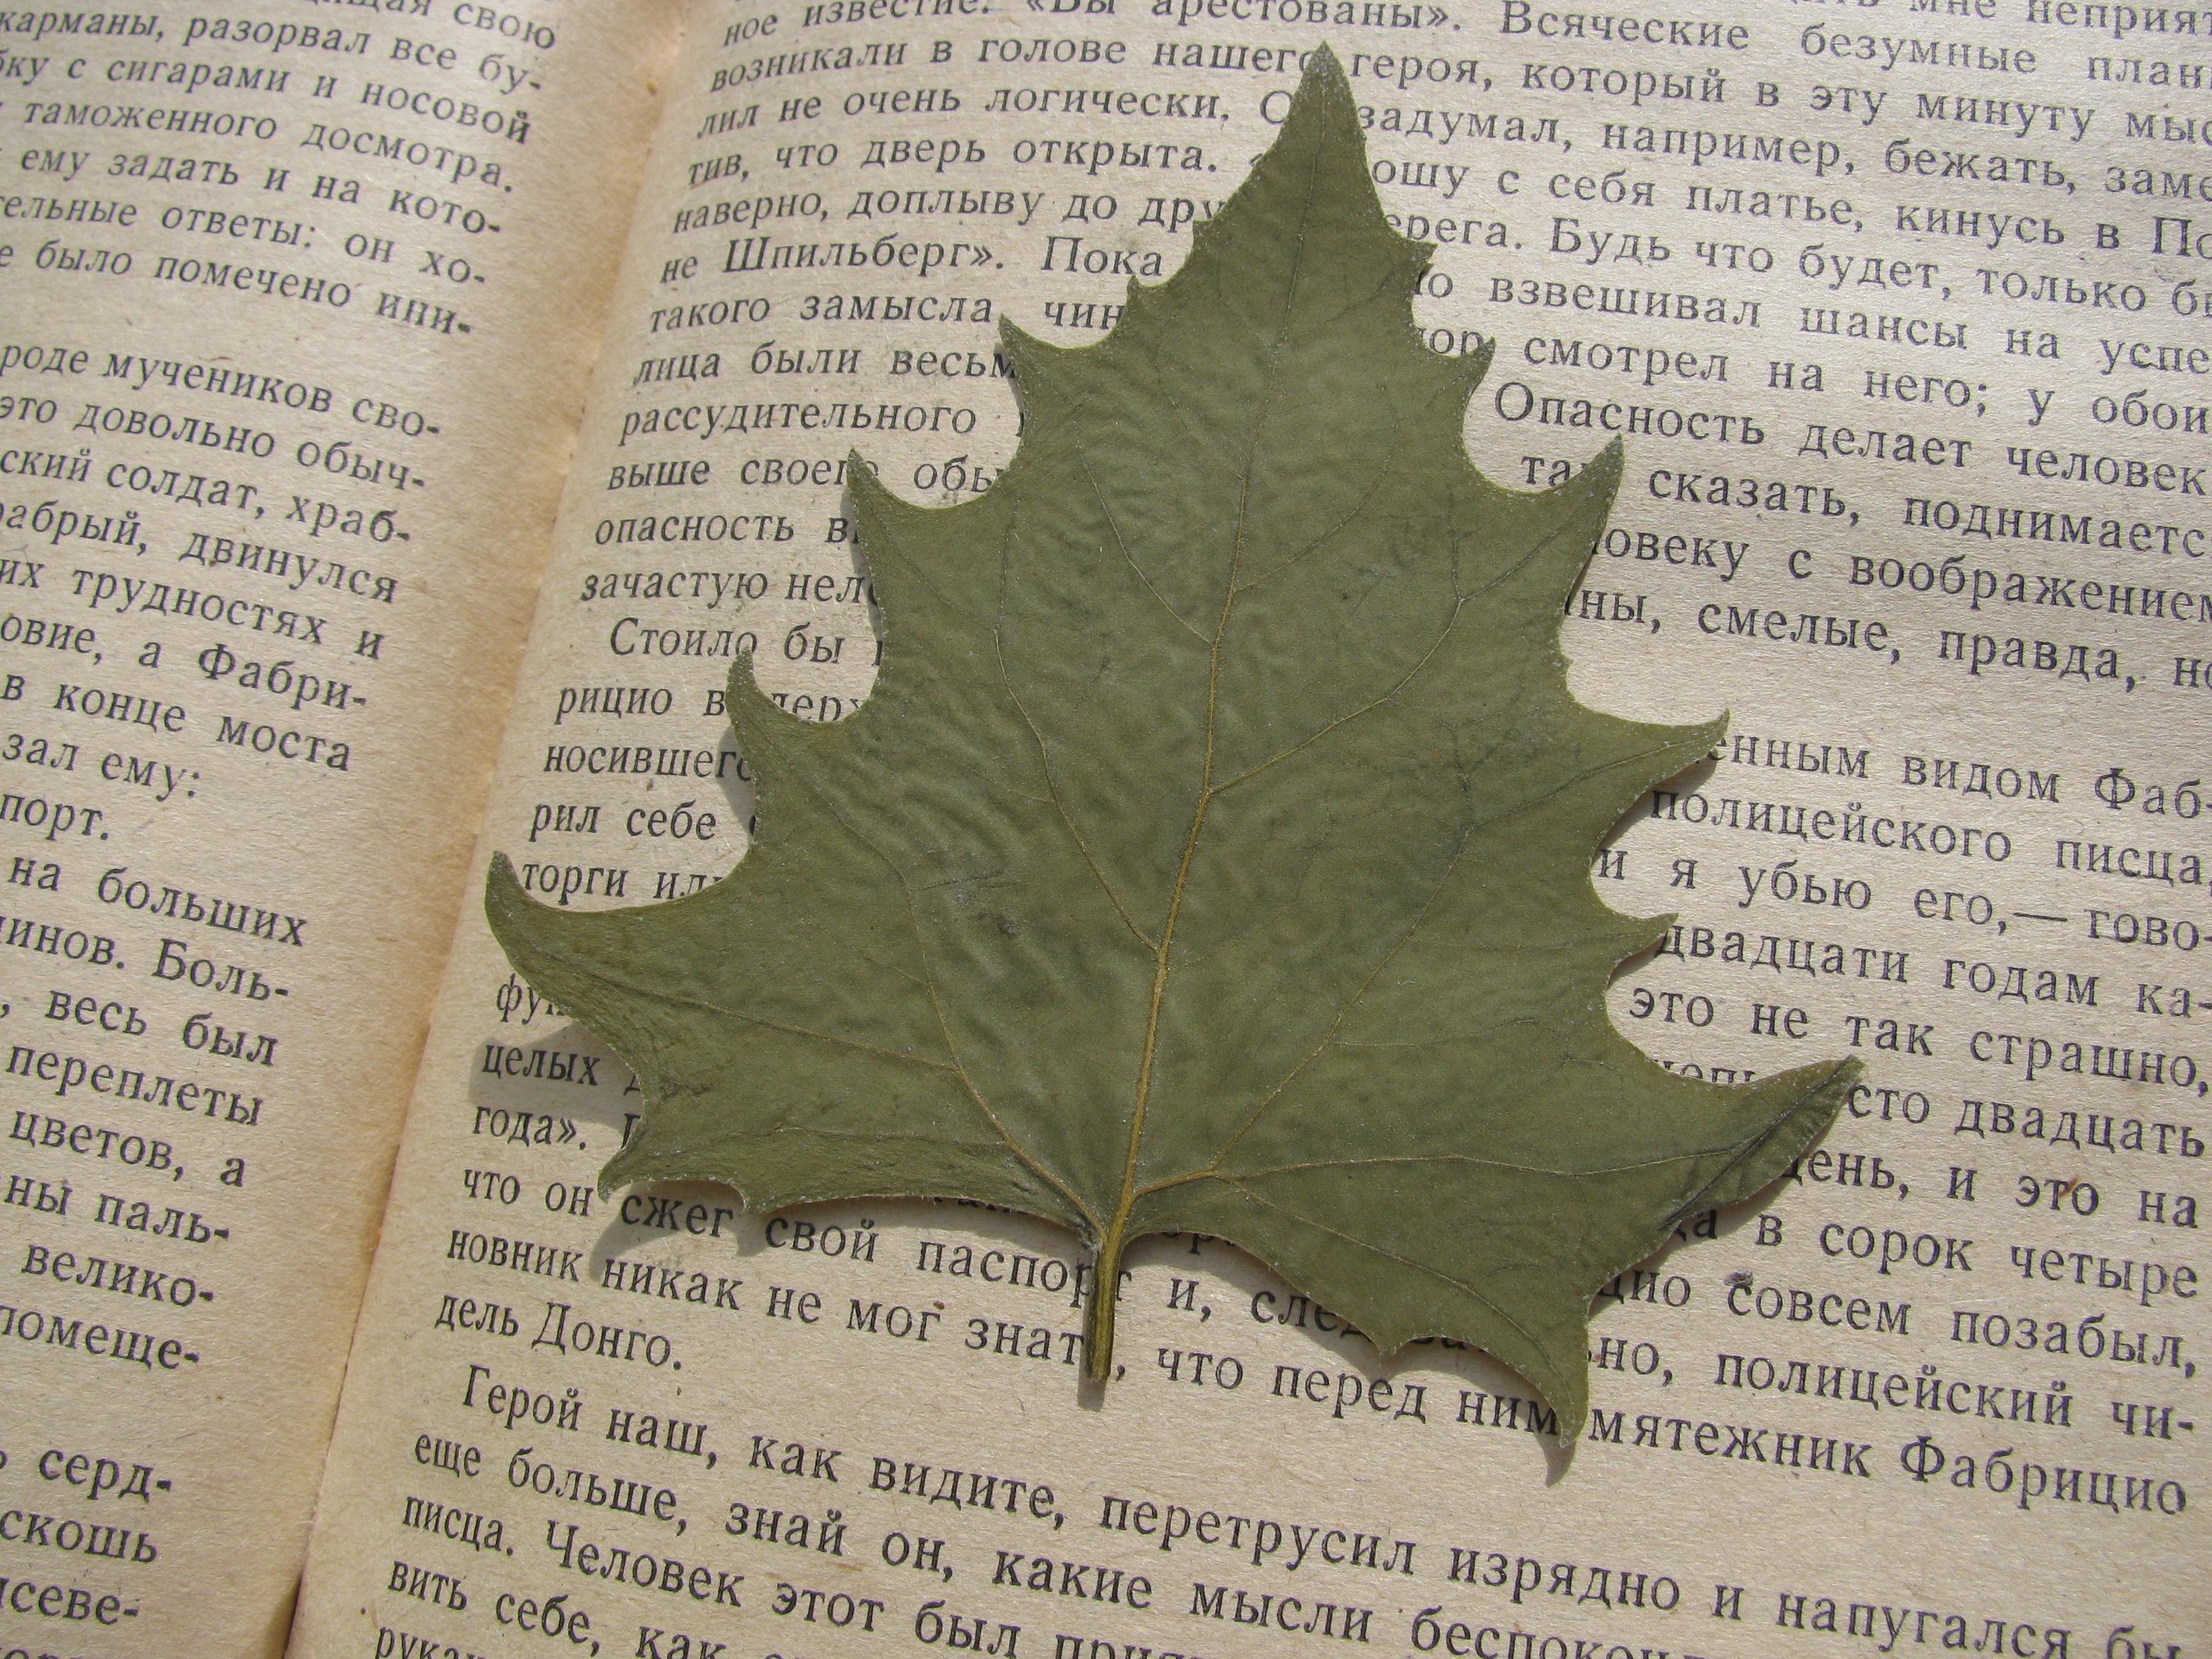 Картинка листка из книги